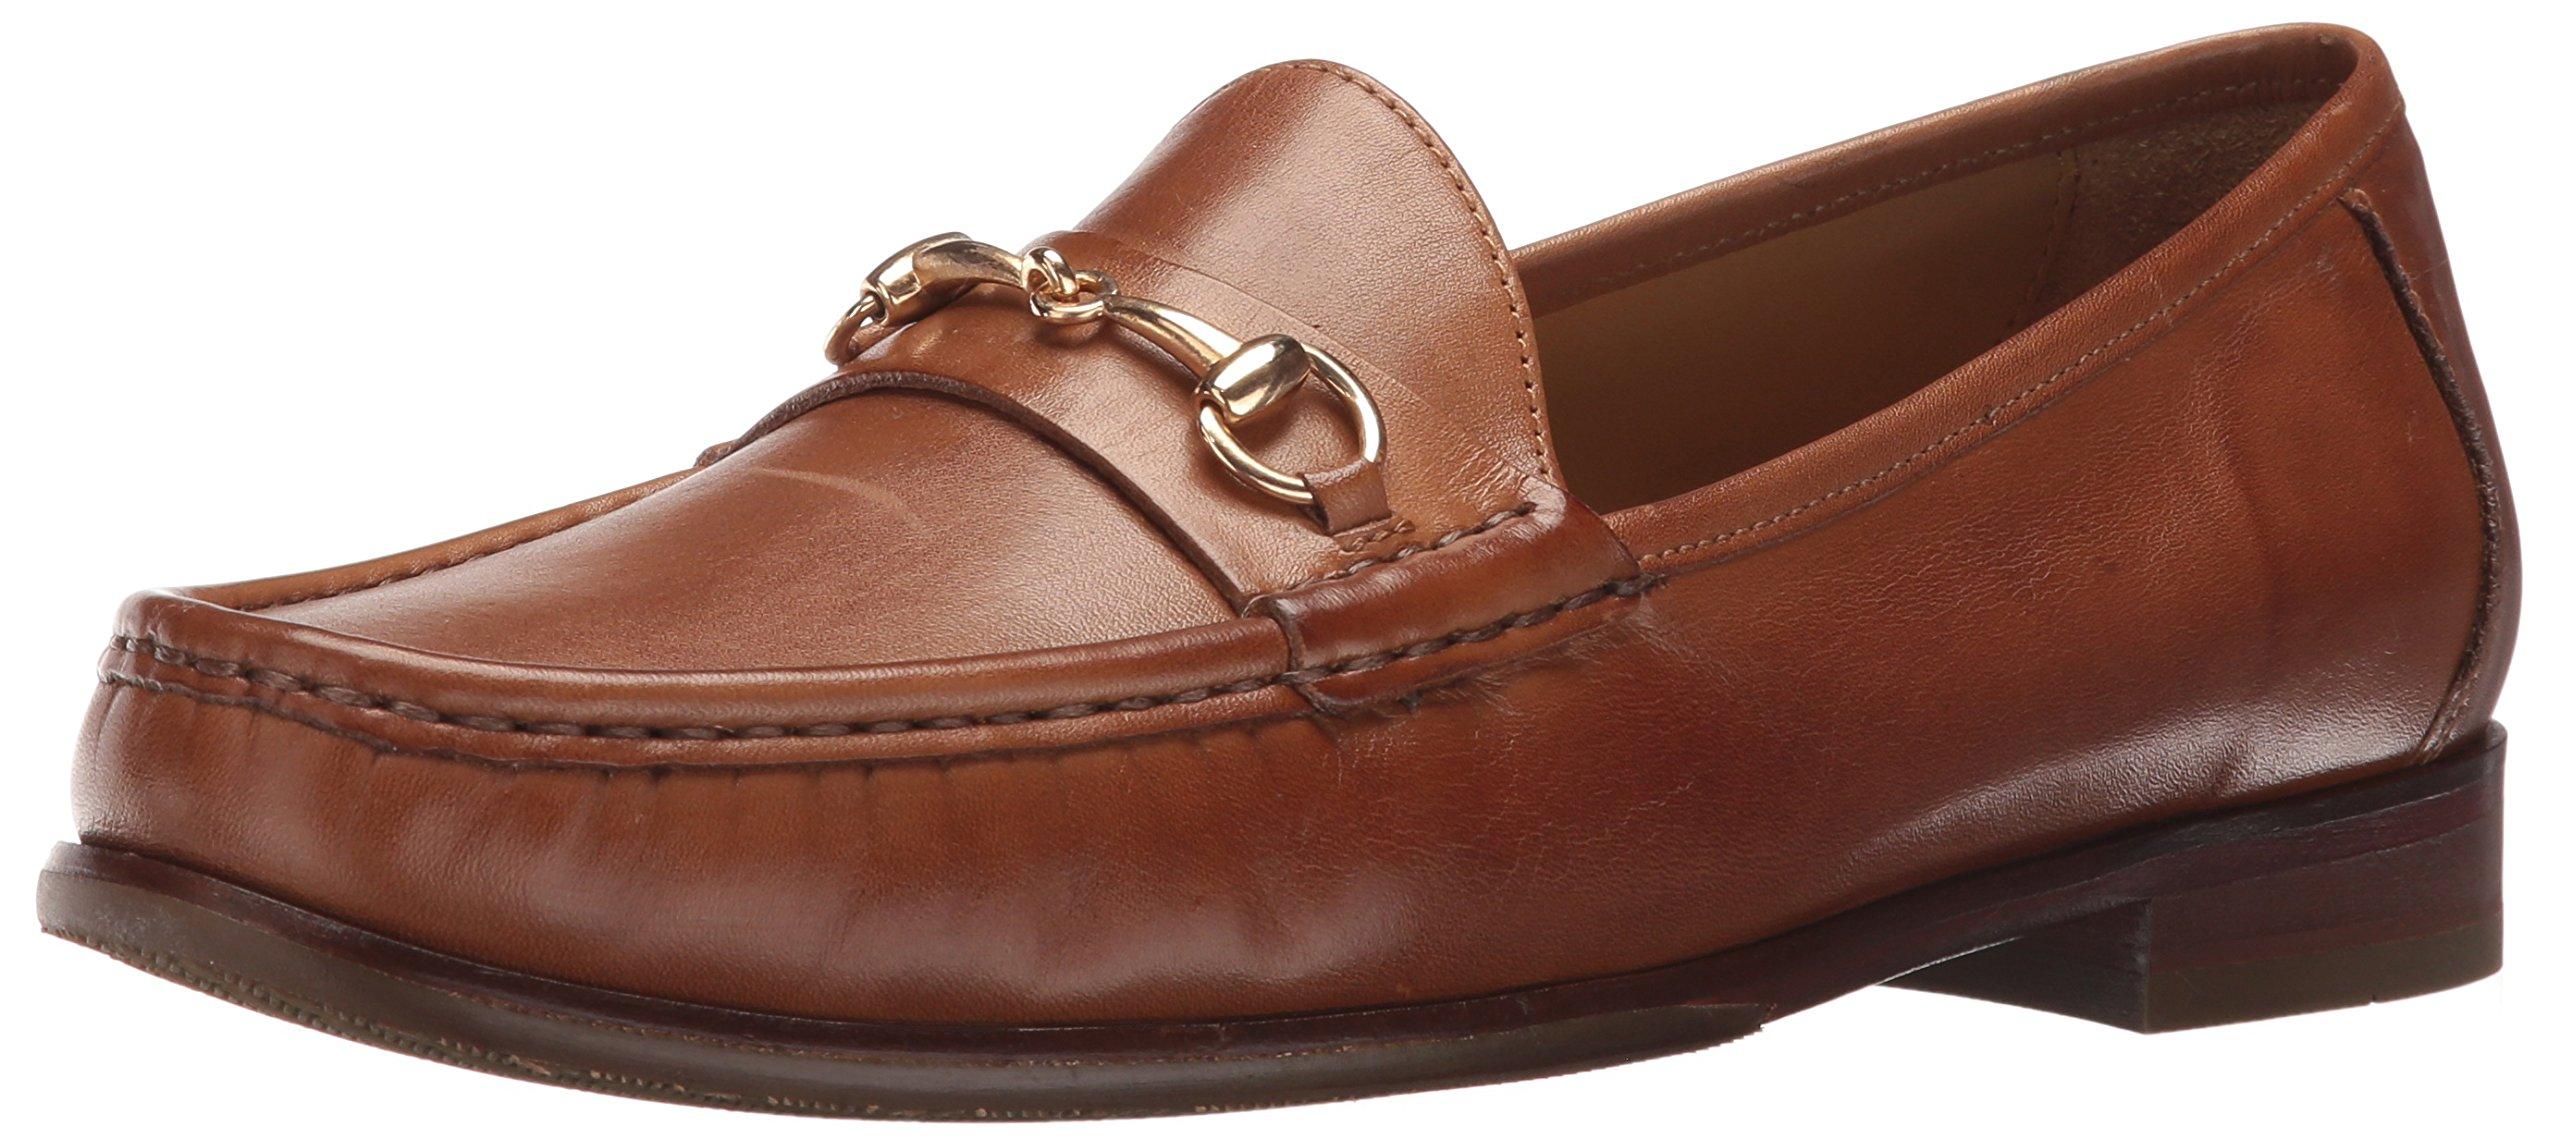 Cole Haan Men's Ascot II Loafer, British Tan, 10.5 Medium US